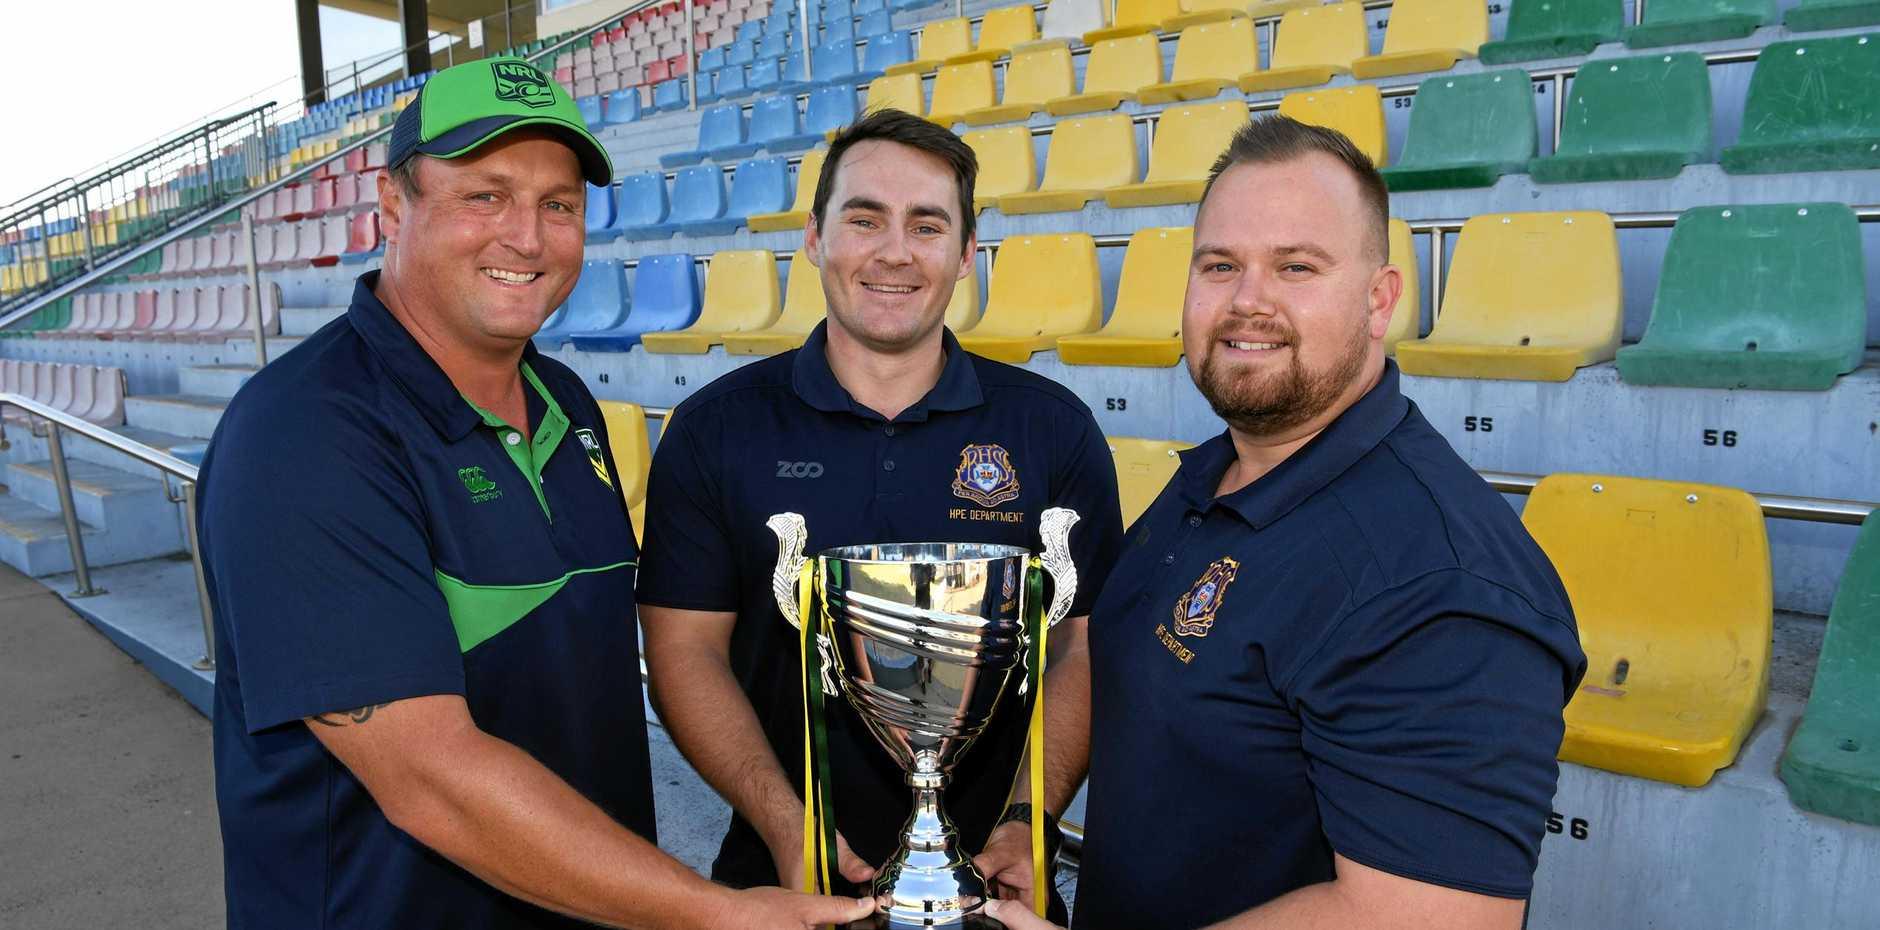 Ian Kearton presents Kevin Sherriff and Mark Handley with the Schoolboy Trophy.